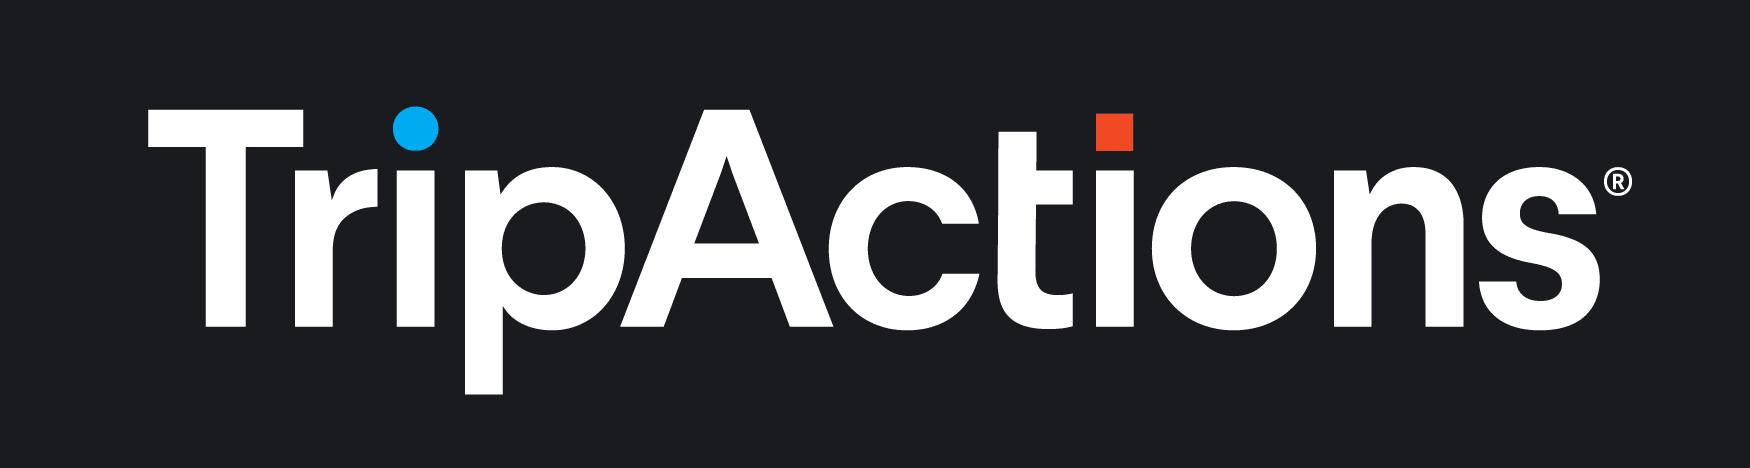 TripActions - TripActions_Logo_Black-1-1-1.png